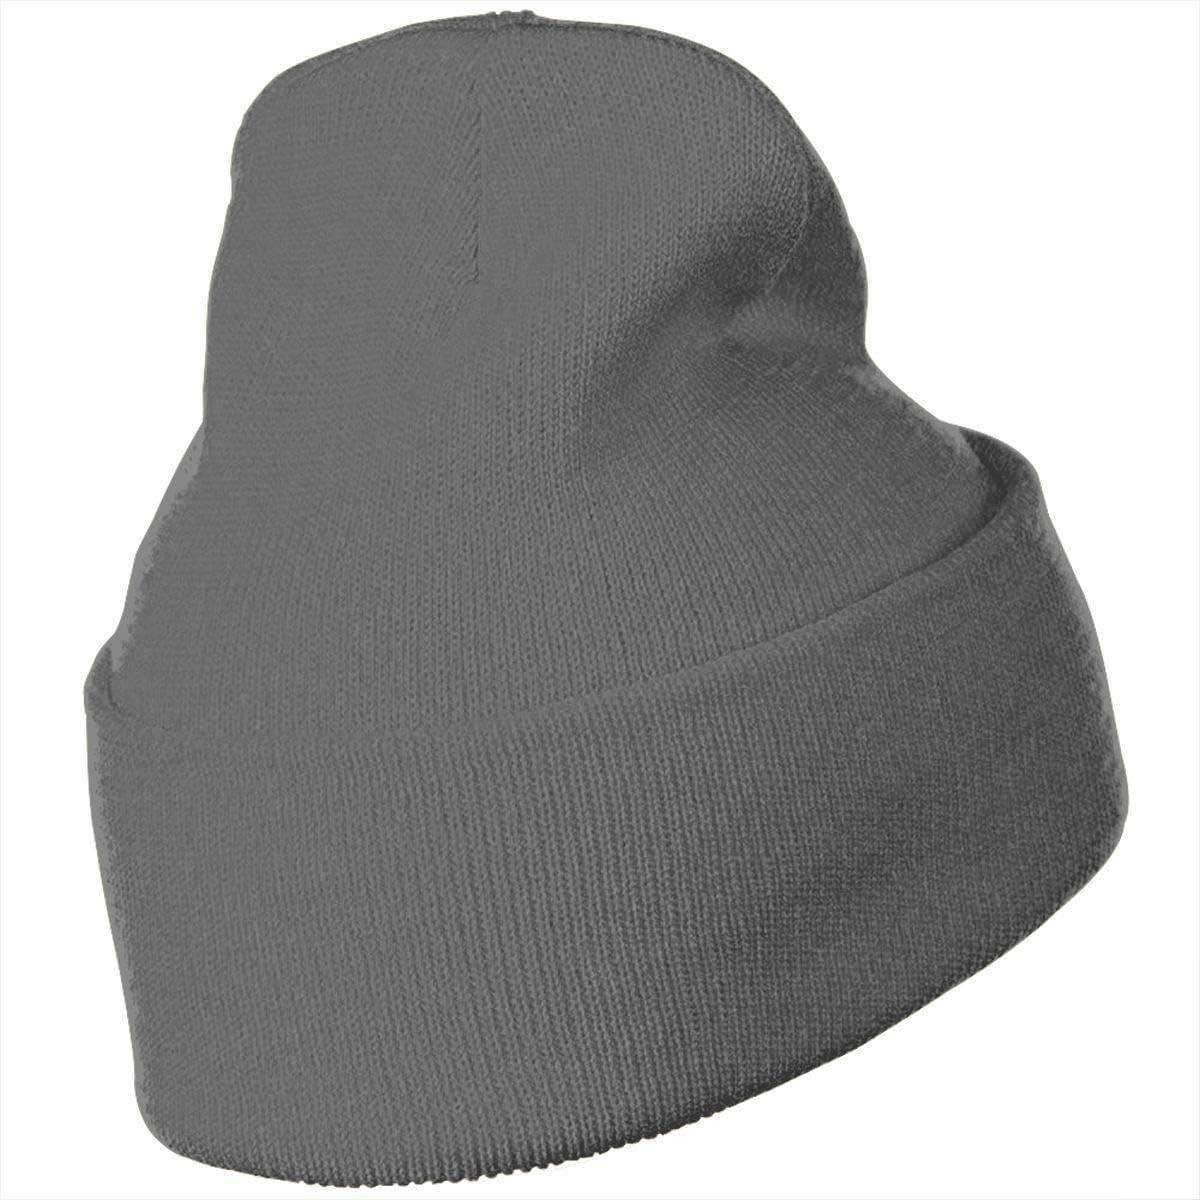 Kilsd Mens /& Womens Dragon Ball Z Skull Beanie Hats Winter Knitted Caps Soft Warm Ski Hat Black